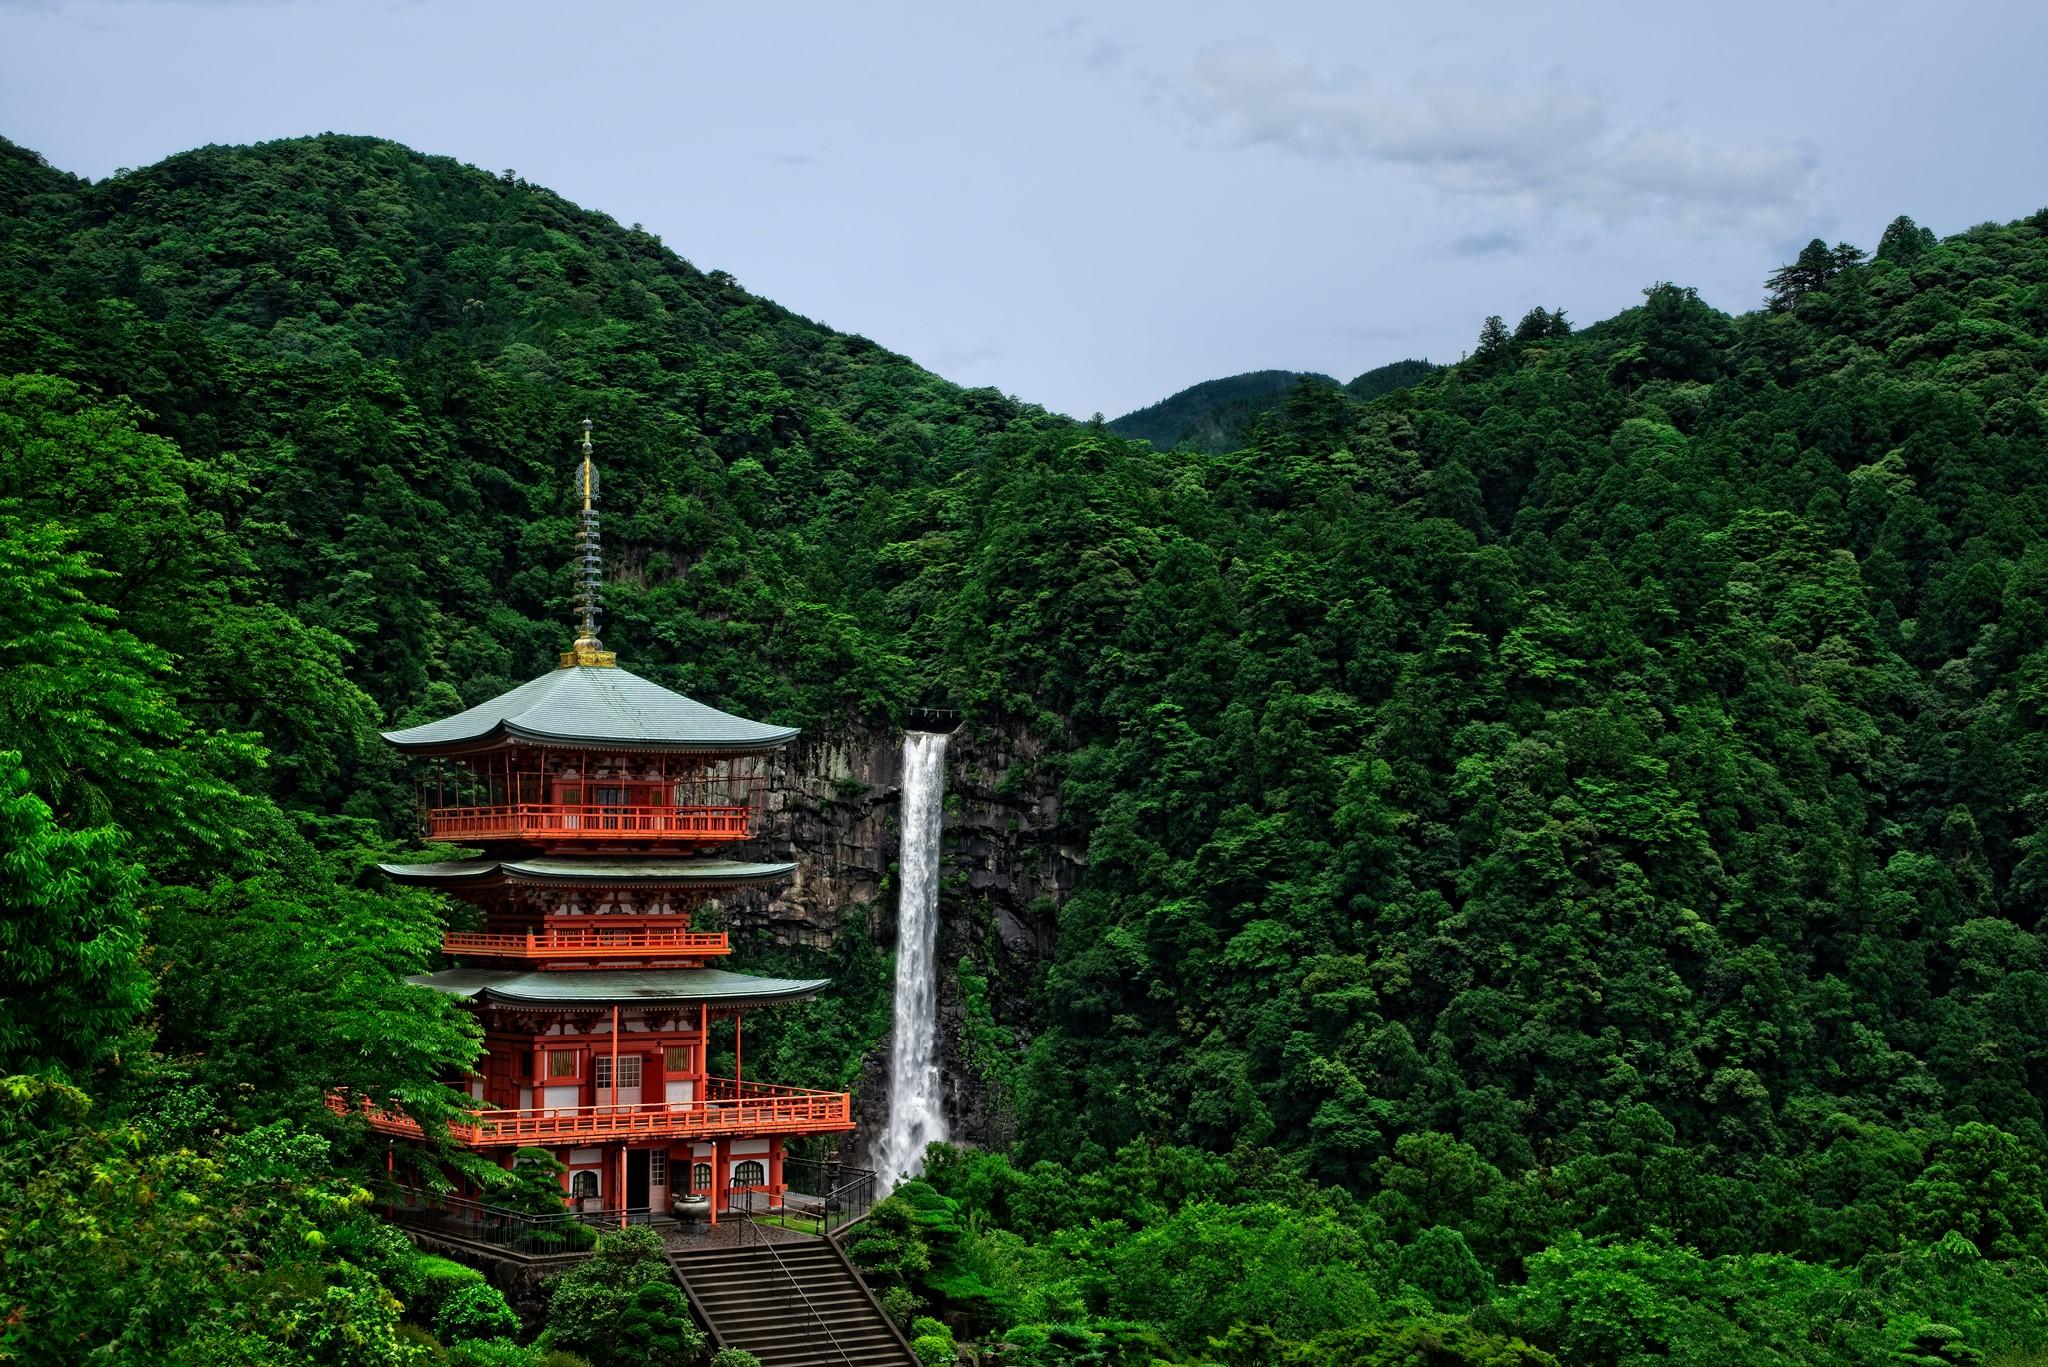 Scott-Davenport-Japan-Wakayama-Prefecture-2017-06-30-0024 copy-Final copy.jpg